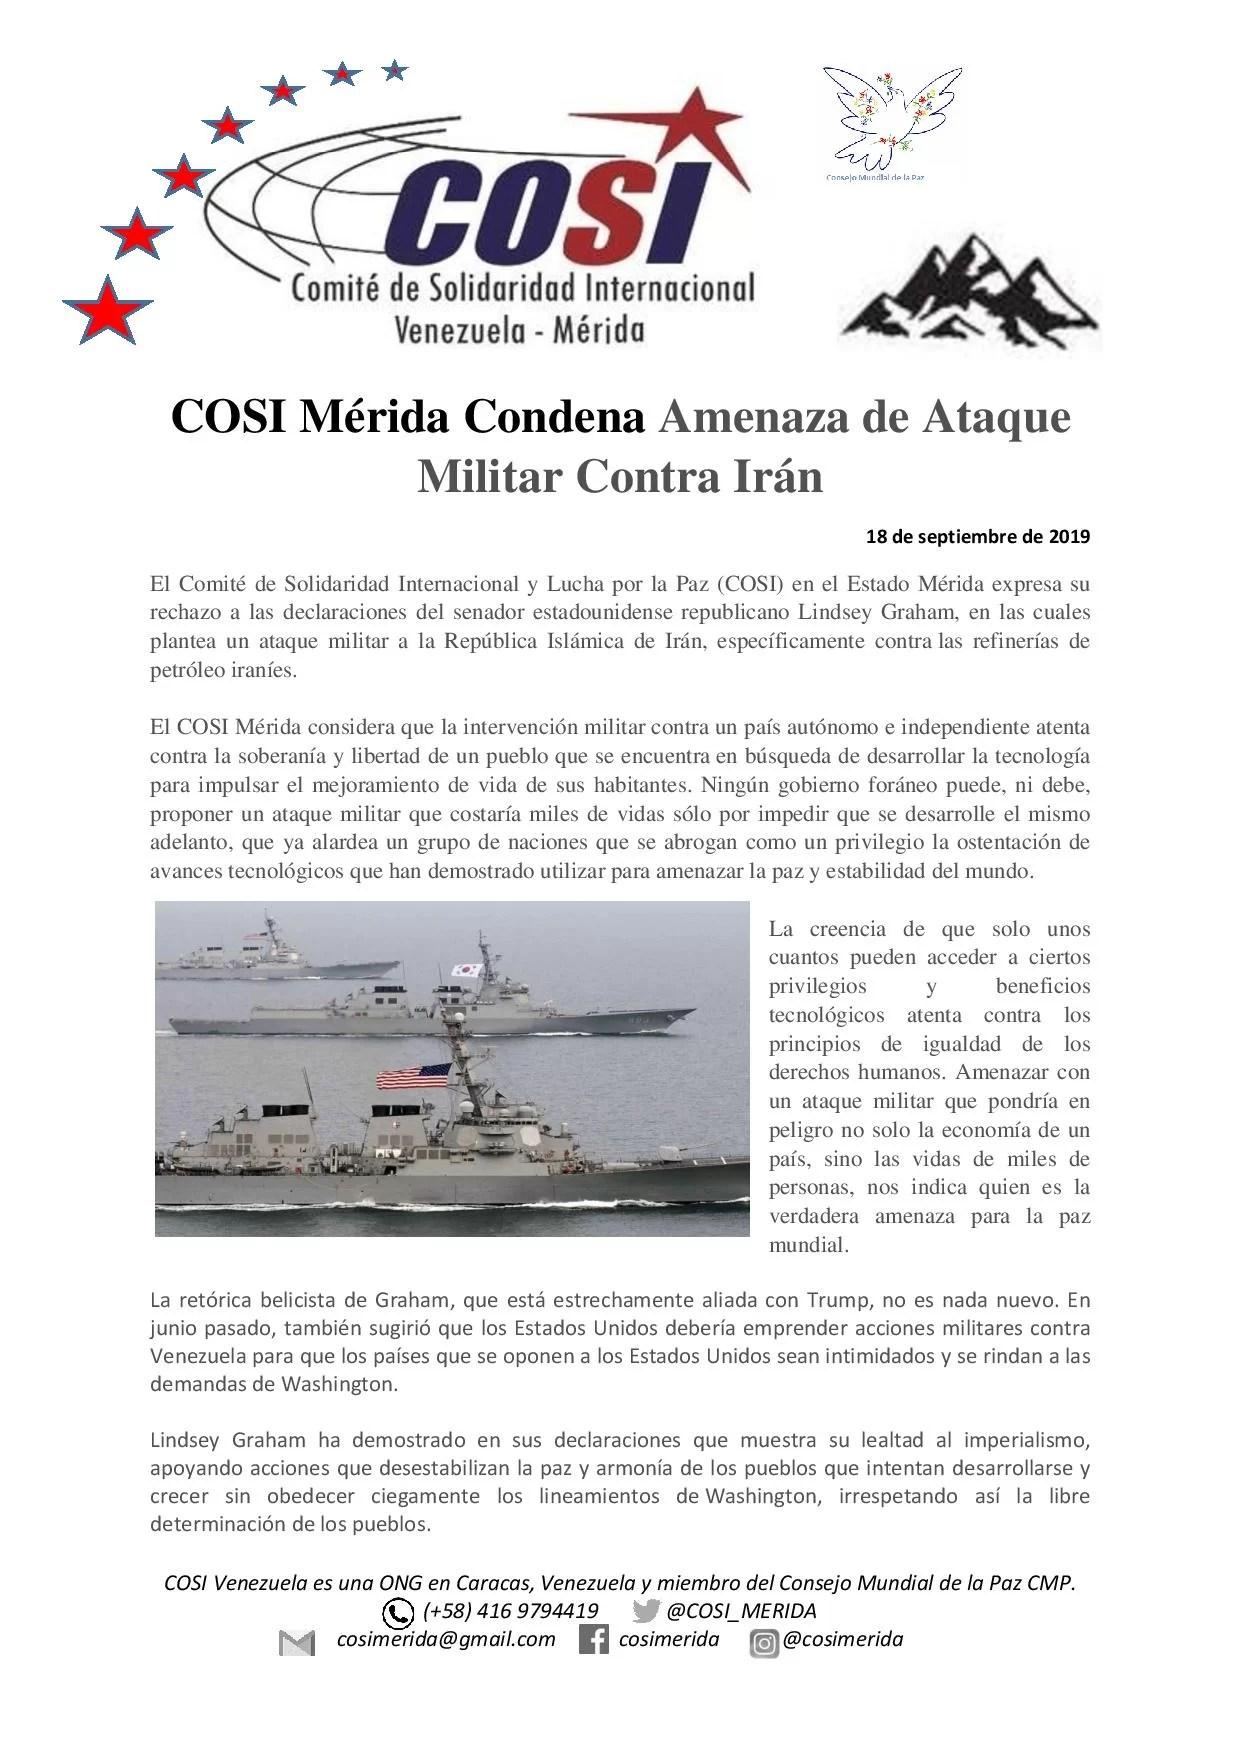 COSI Mérida Condena Amenaza de Ataque Militar Contra Iran